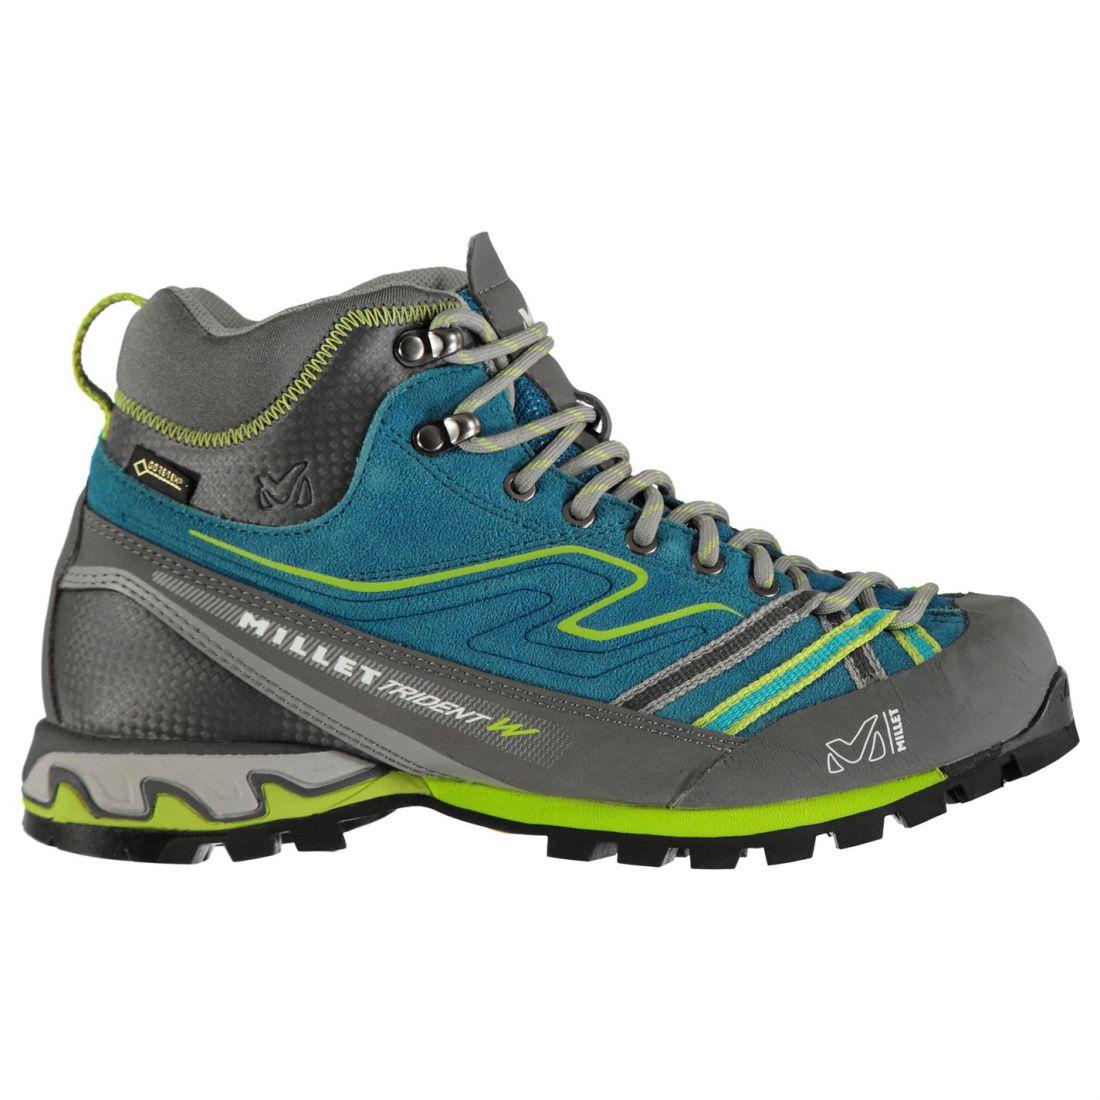 Millet Triden GTX Mid L00 Ladies Walking Boots   high quality